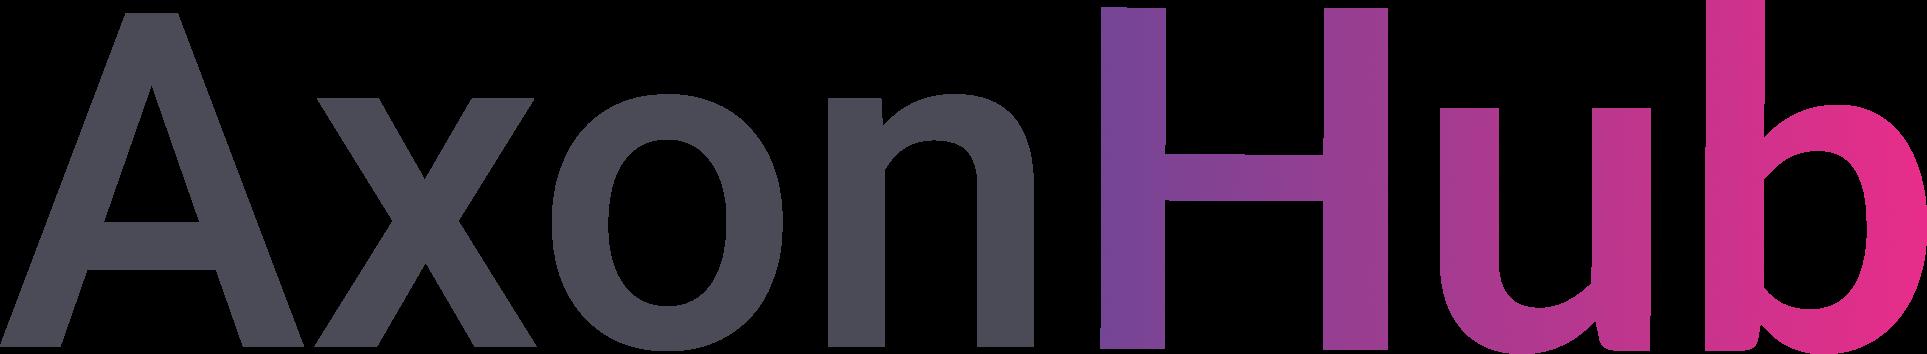 AxonHub logo